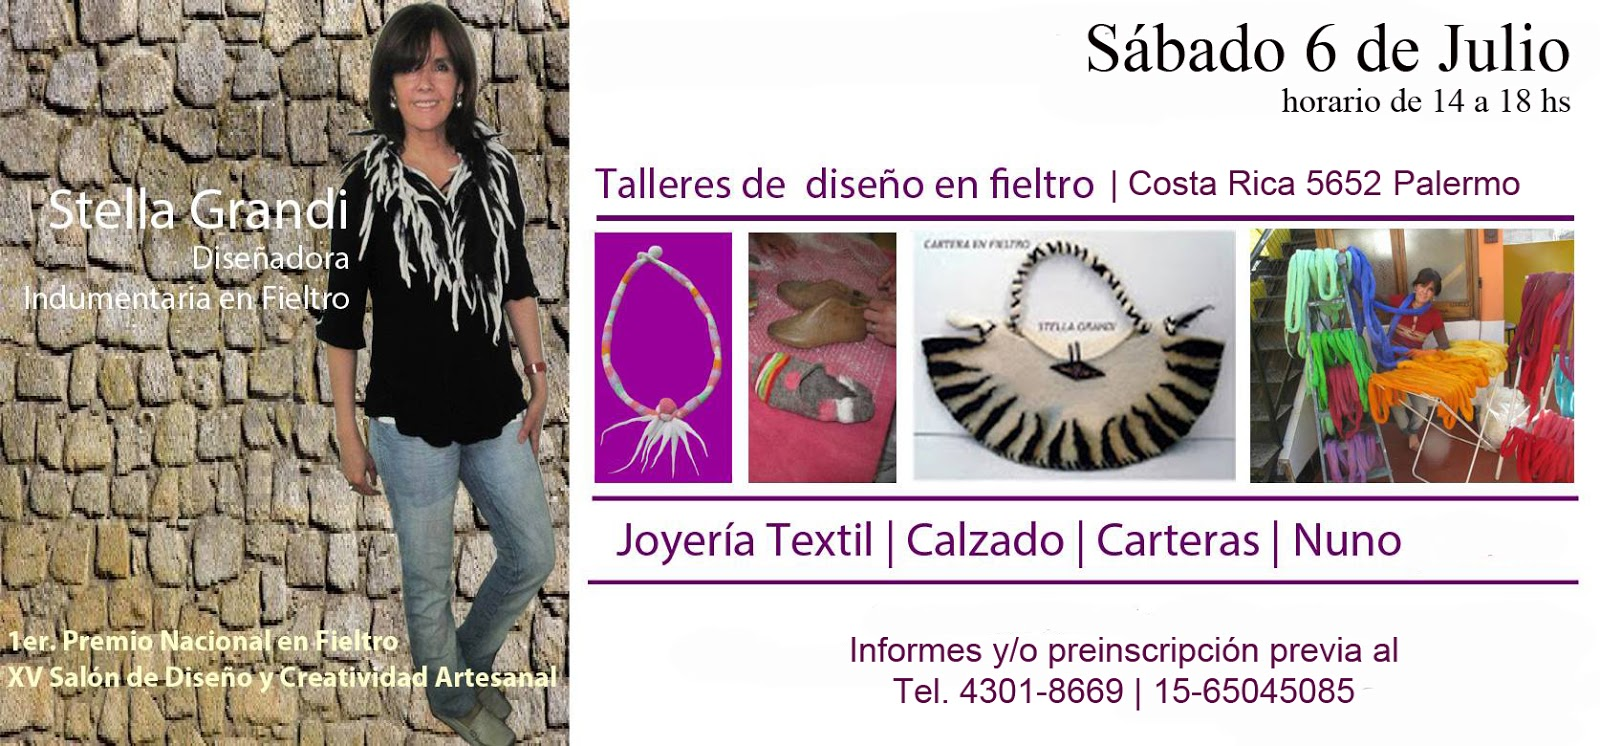 TALLER DE FIELTRO SABADO 6 de Julio